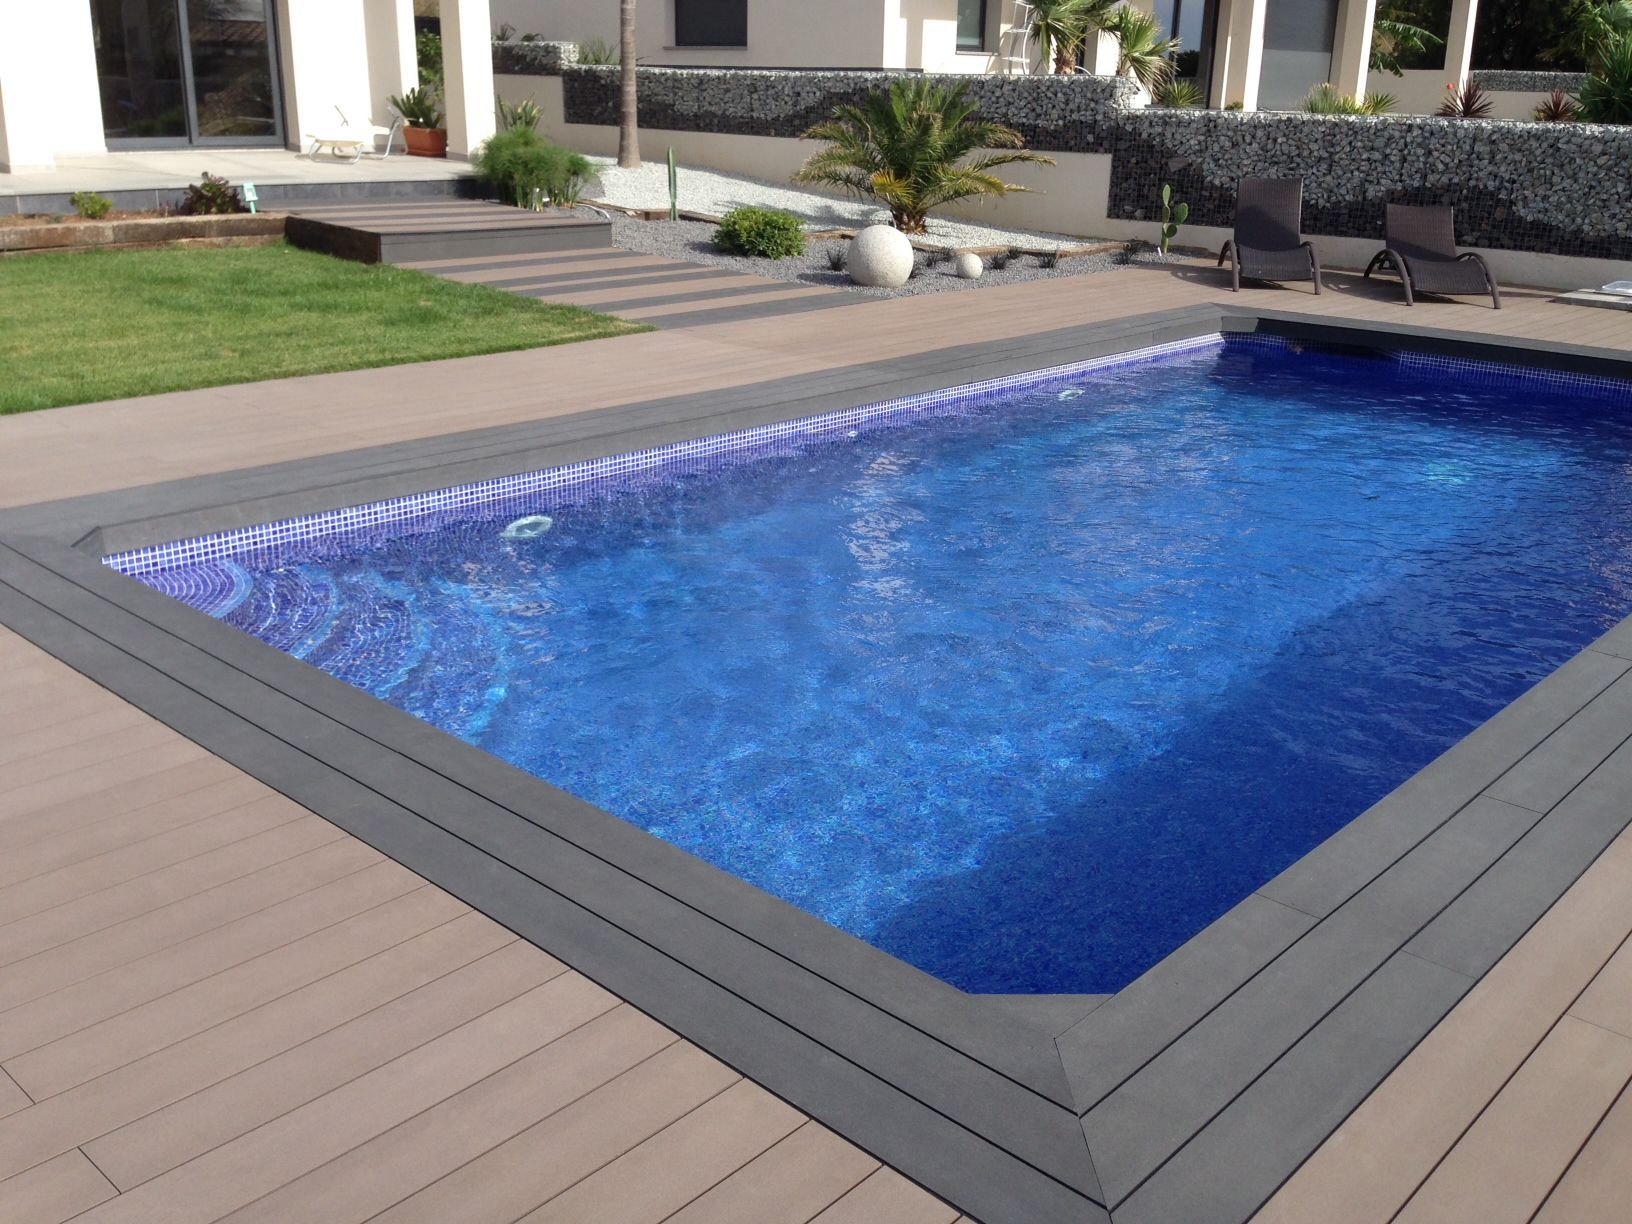 Tarima exterior composite alrededor de piscinas combinando - Tarima para piscinas ...